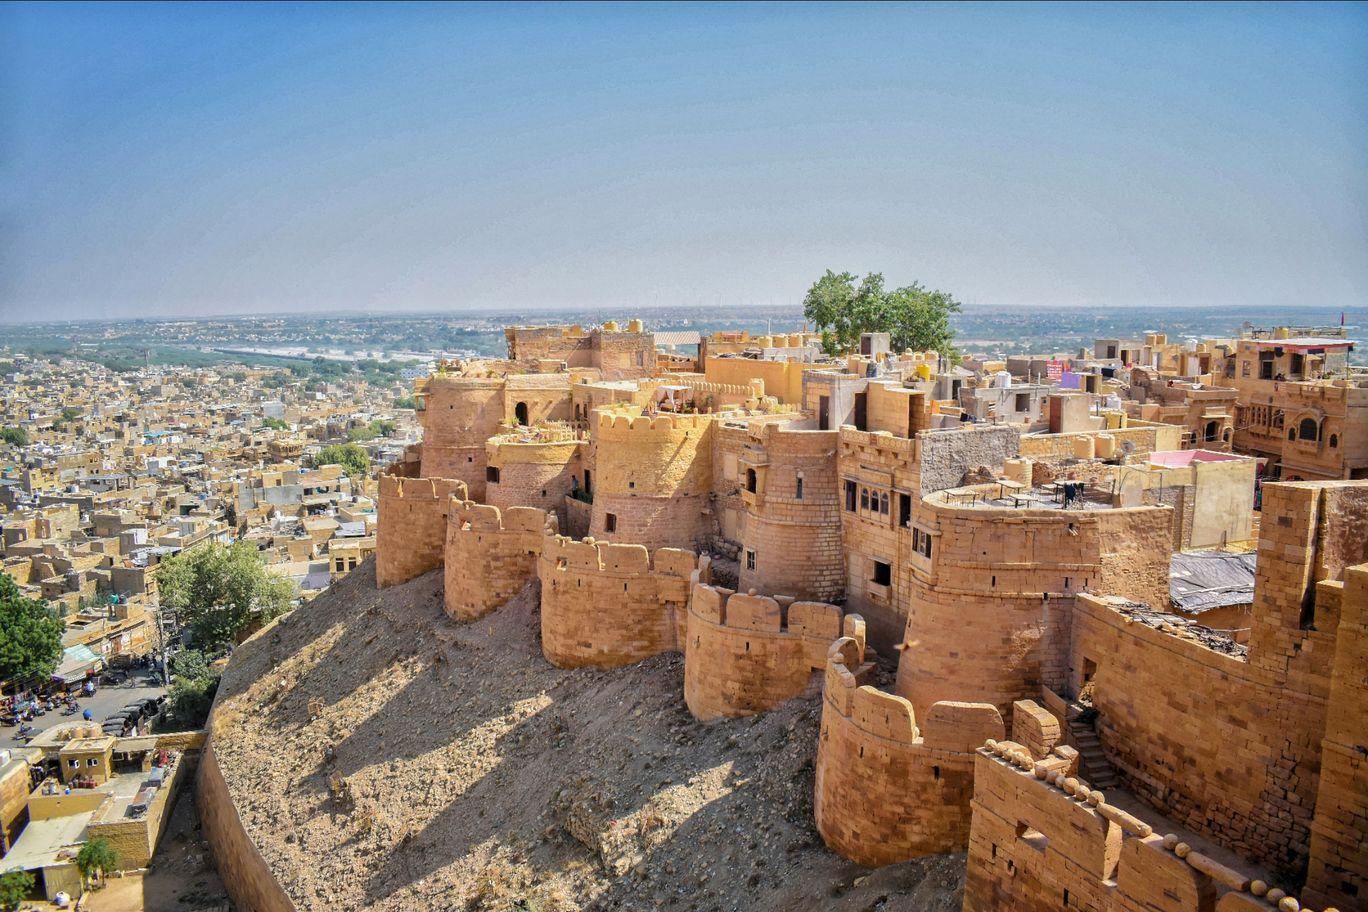 Photo of Jaisalmer Fort By Saurav Akhouri